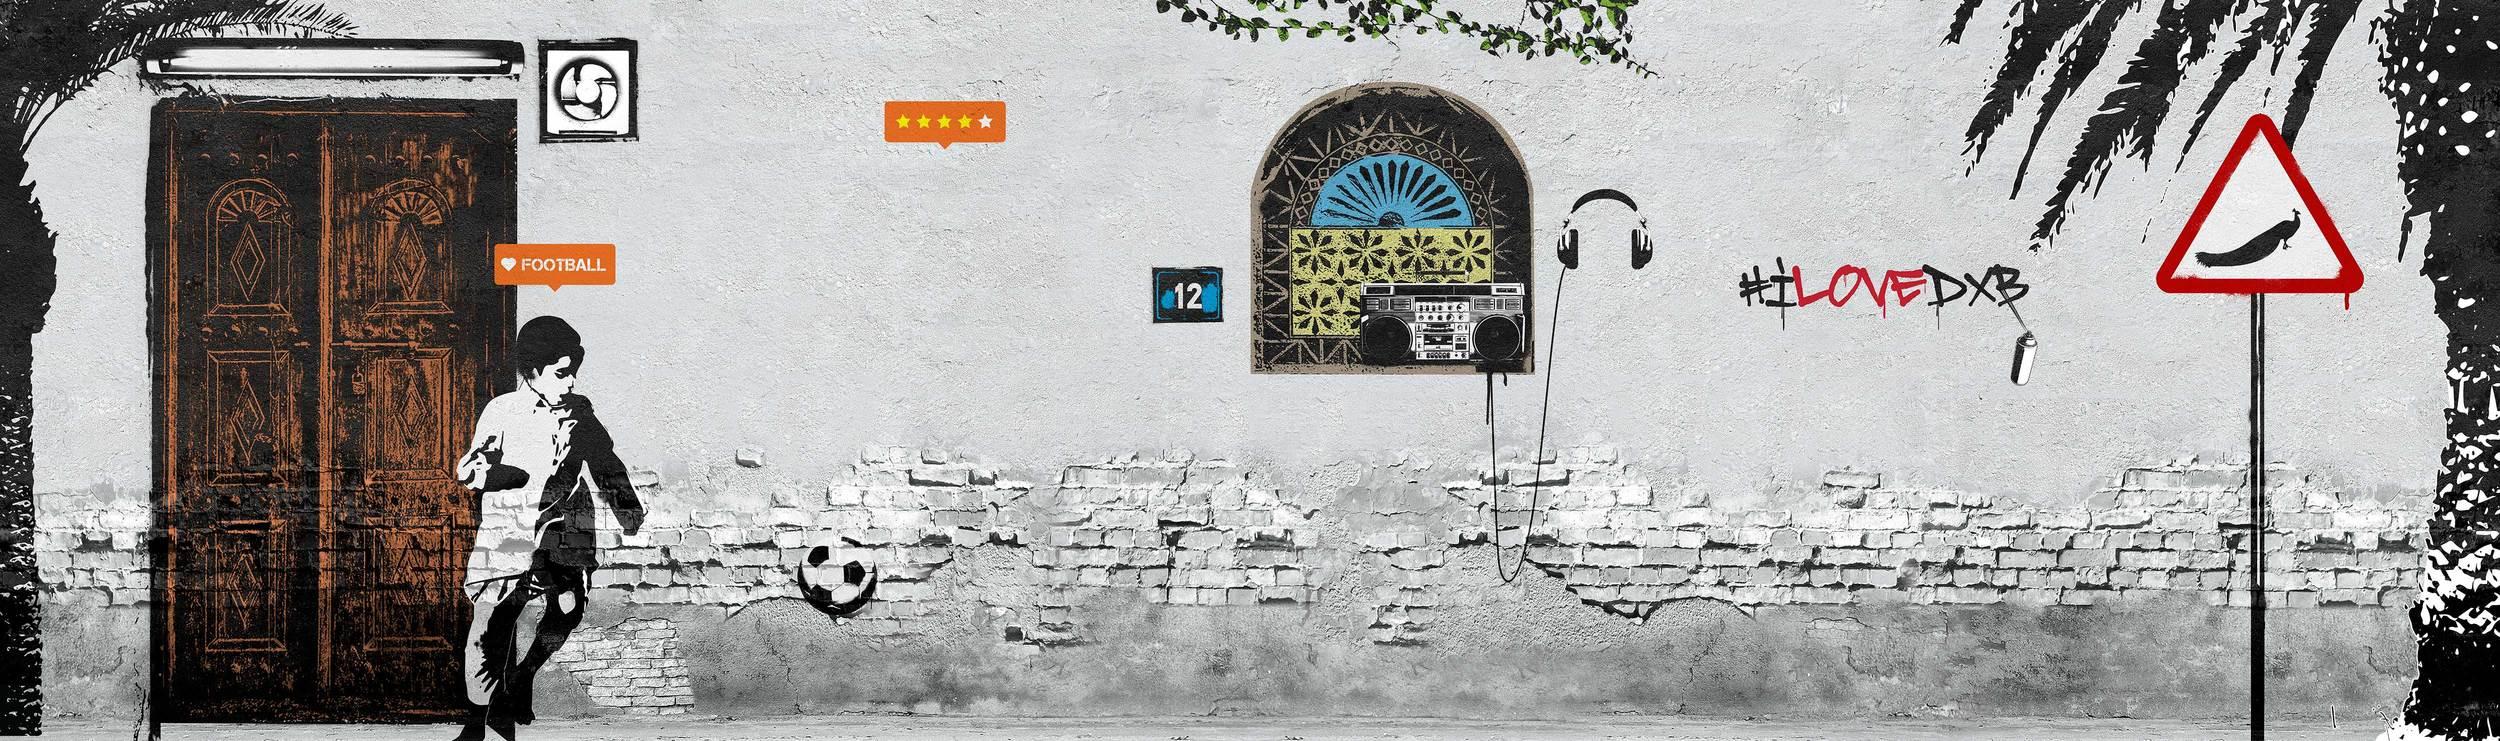 Wall_03_796cm_216cm-Hi-04-copy.jpg